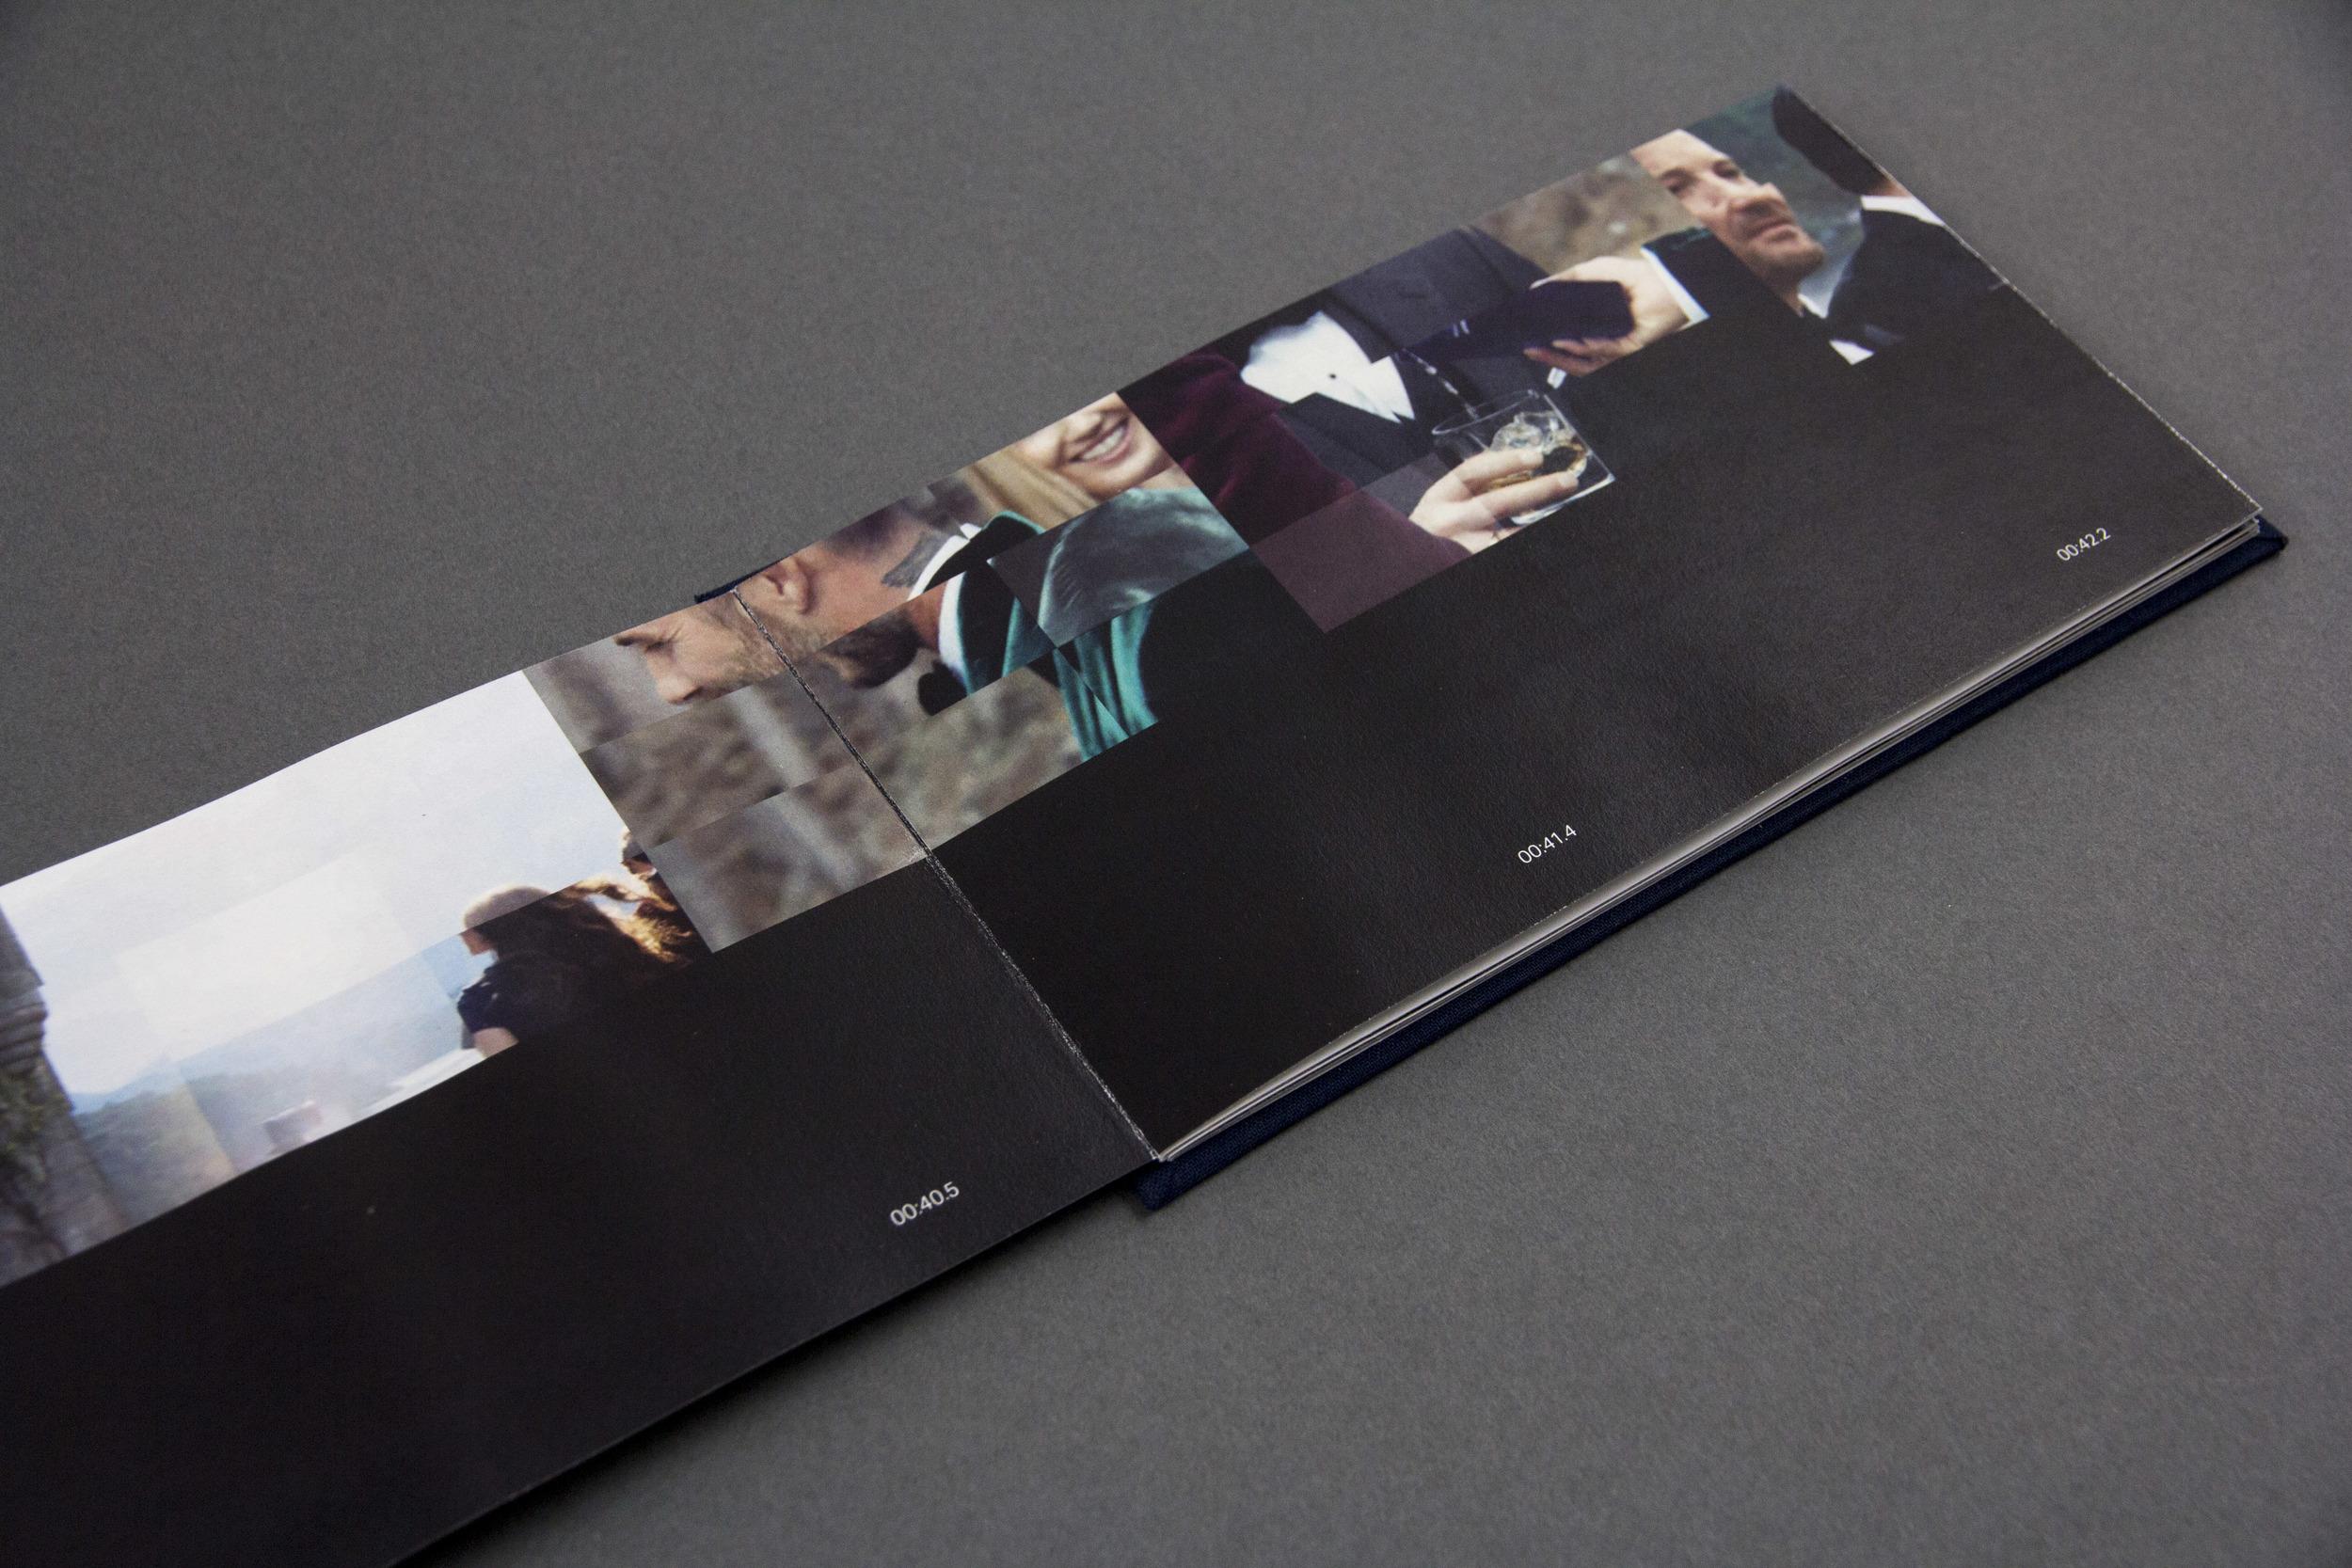 Accordion-fold books